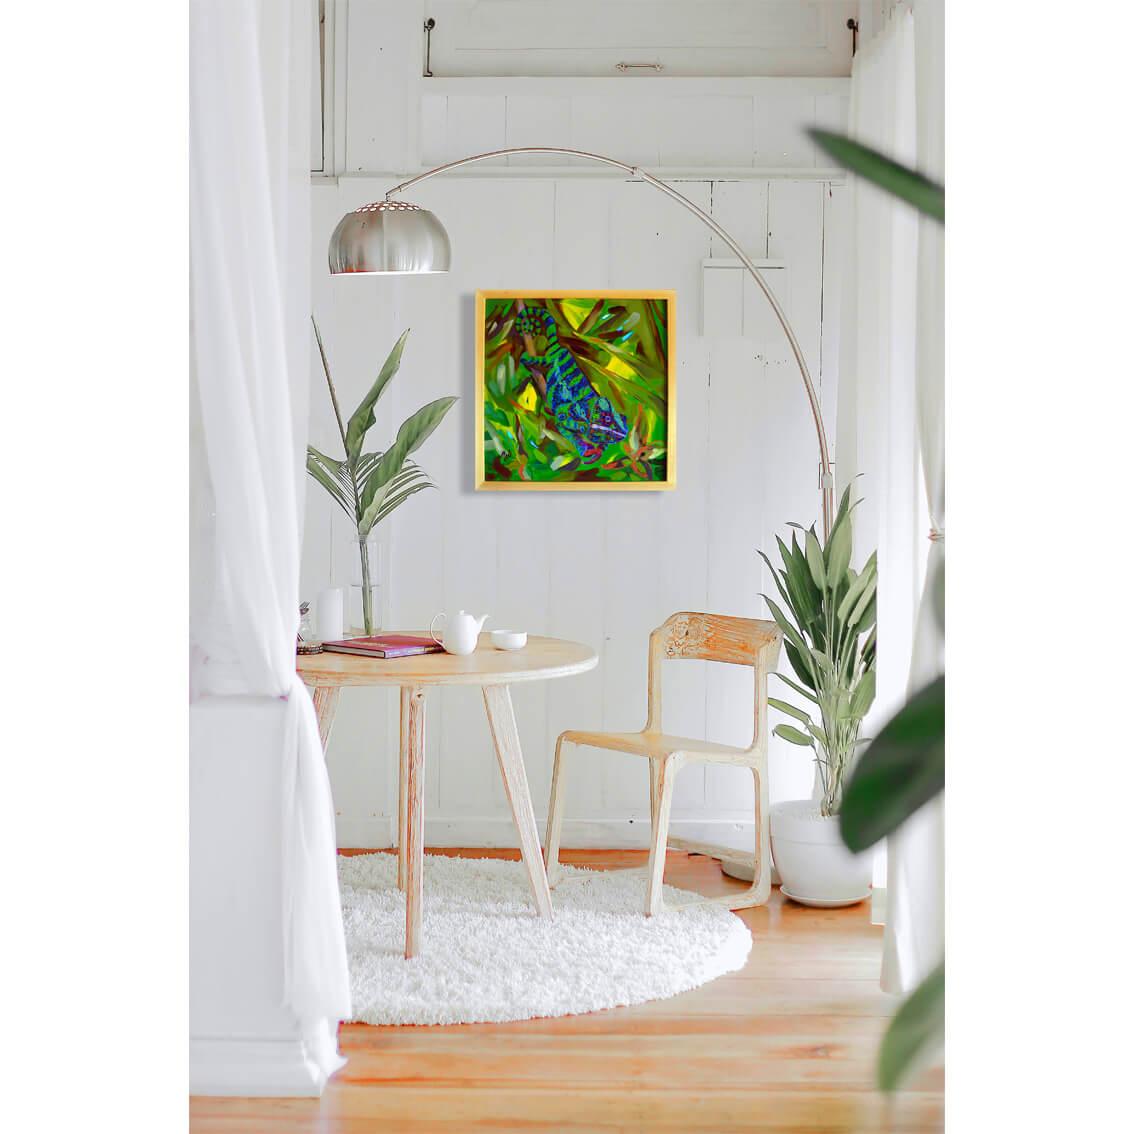 Camaleonte in arte